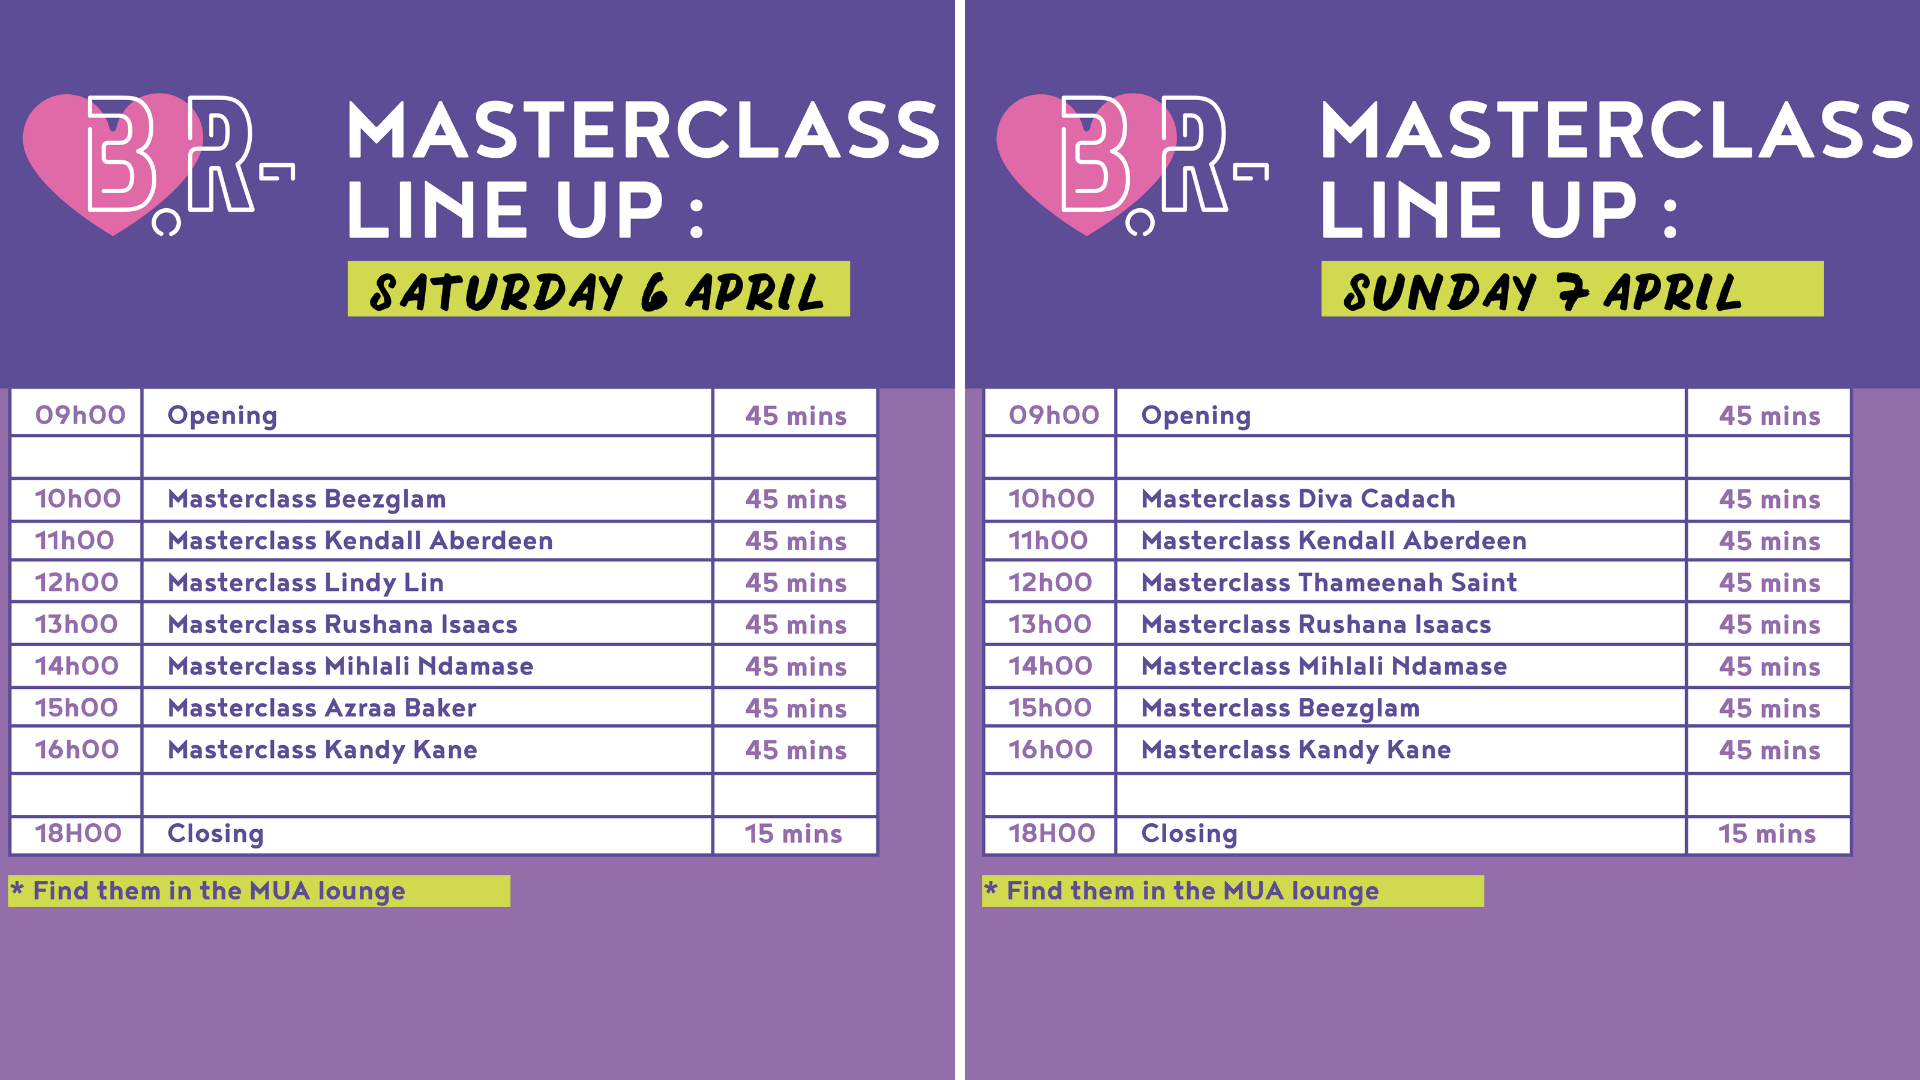 Masterclass Lineup.png